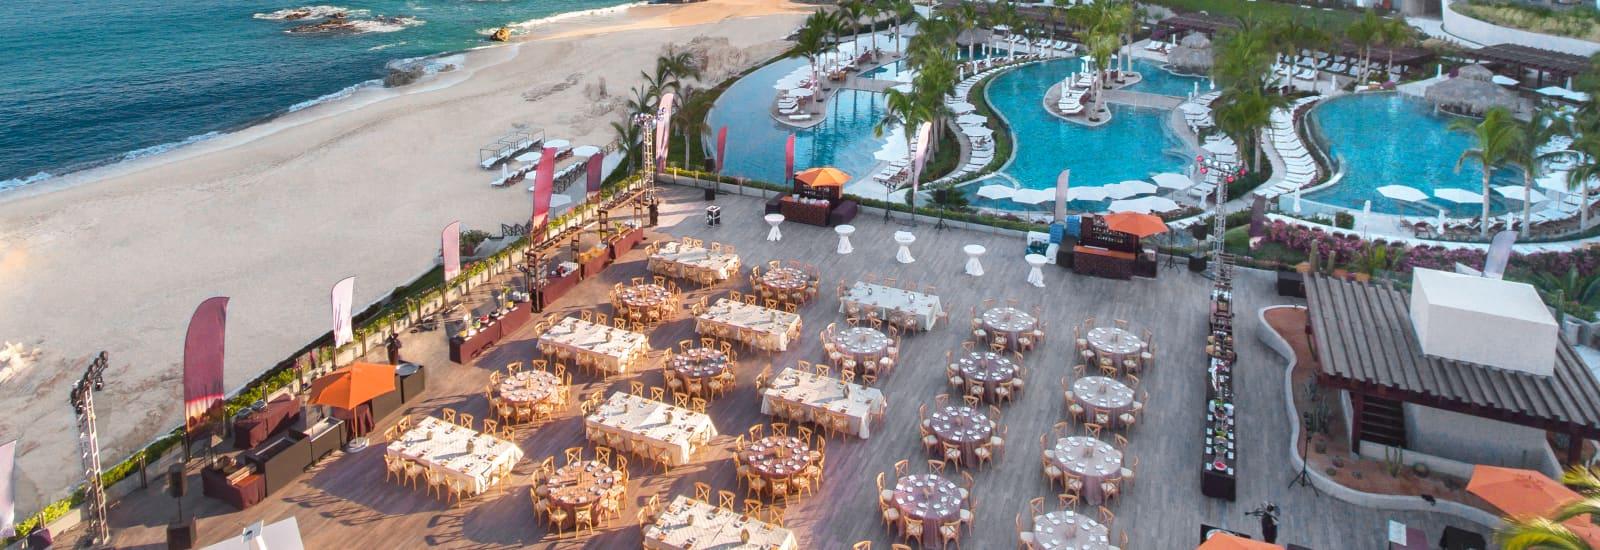 Meetings Facilities in Grand Velas Los Cabos